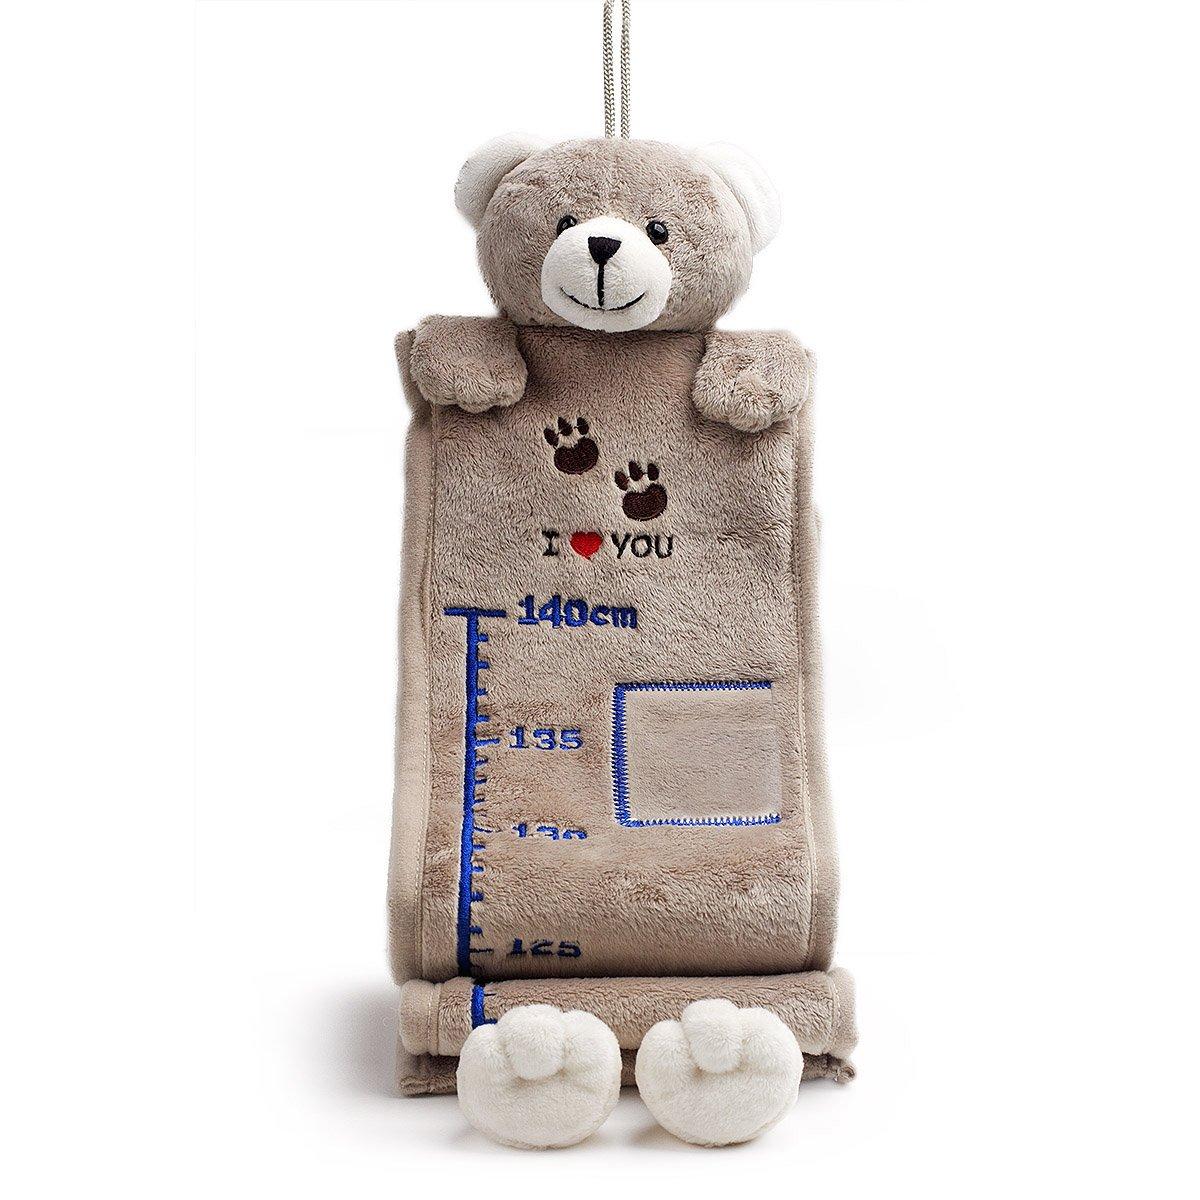 Bear of Allan Stuffed Animal Growth Chart 65 Inch (Gray Teddy Bear)